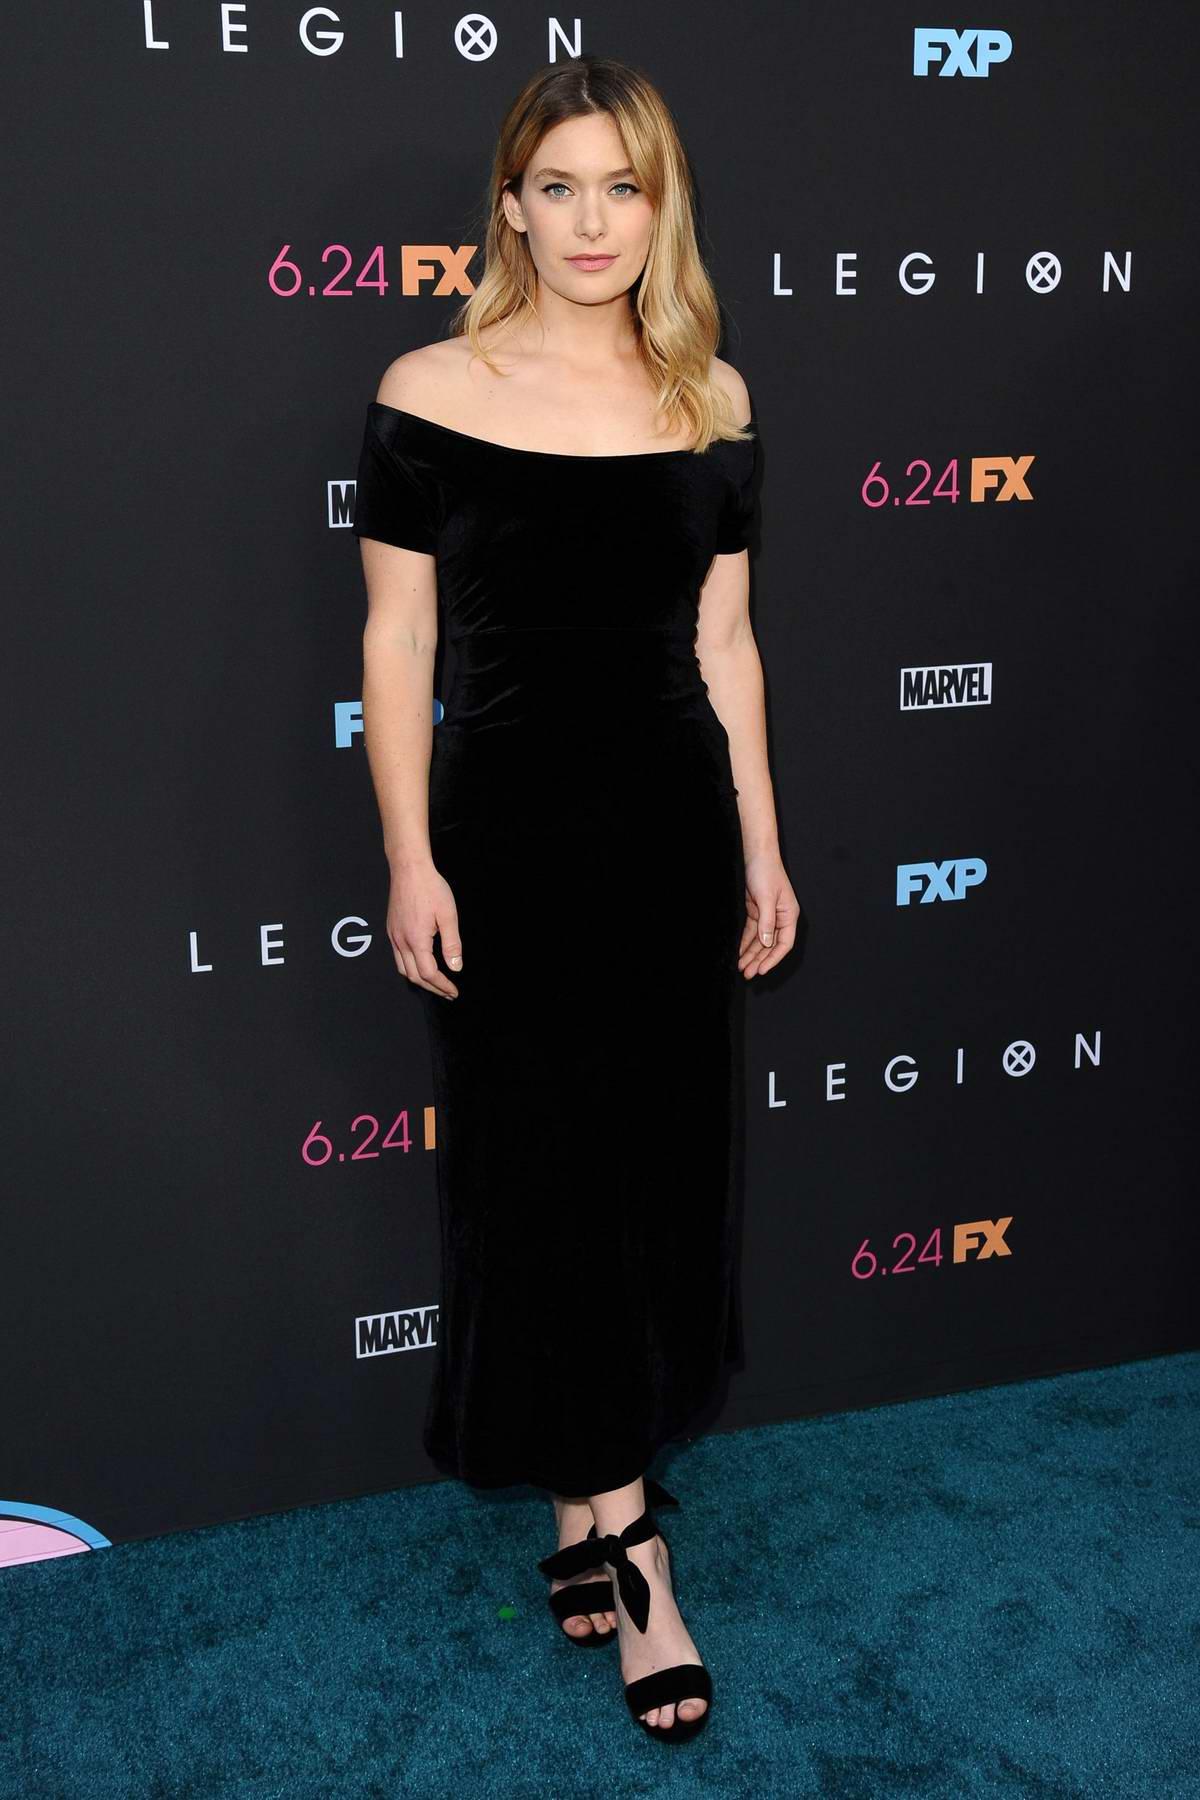 Rachel Keller attends the Premiere of FX's 'Legion' Season 3 in Hollywood, California